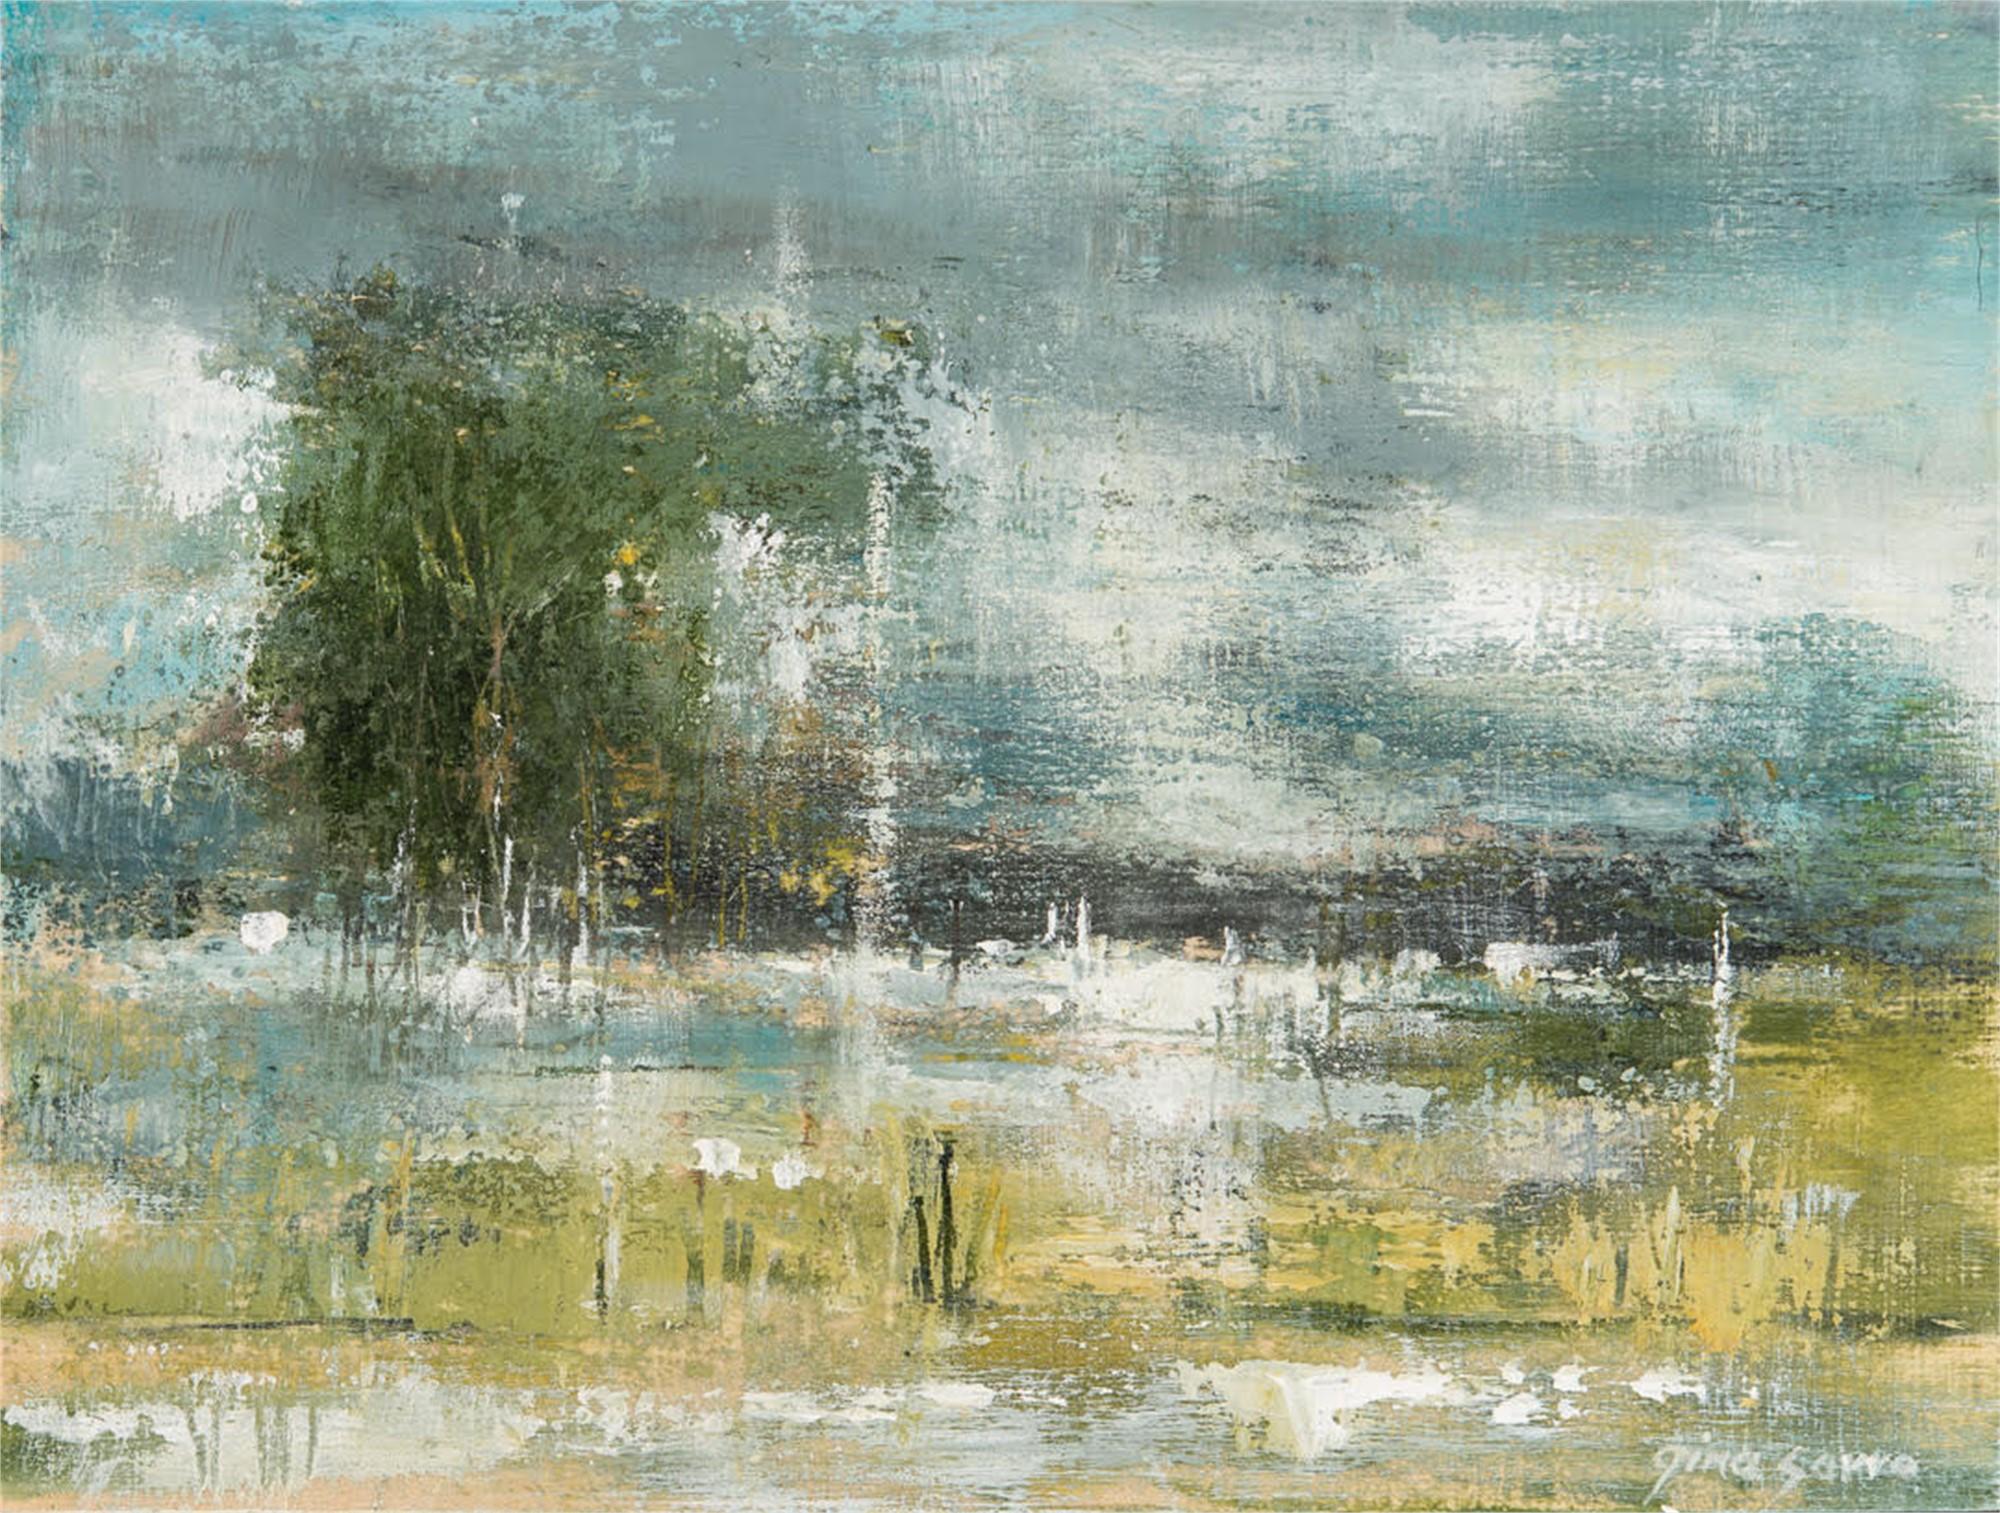 Vertical Horizons 17 by Gina Sarro